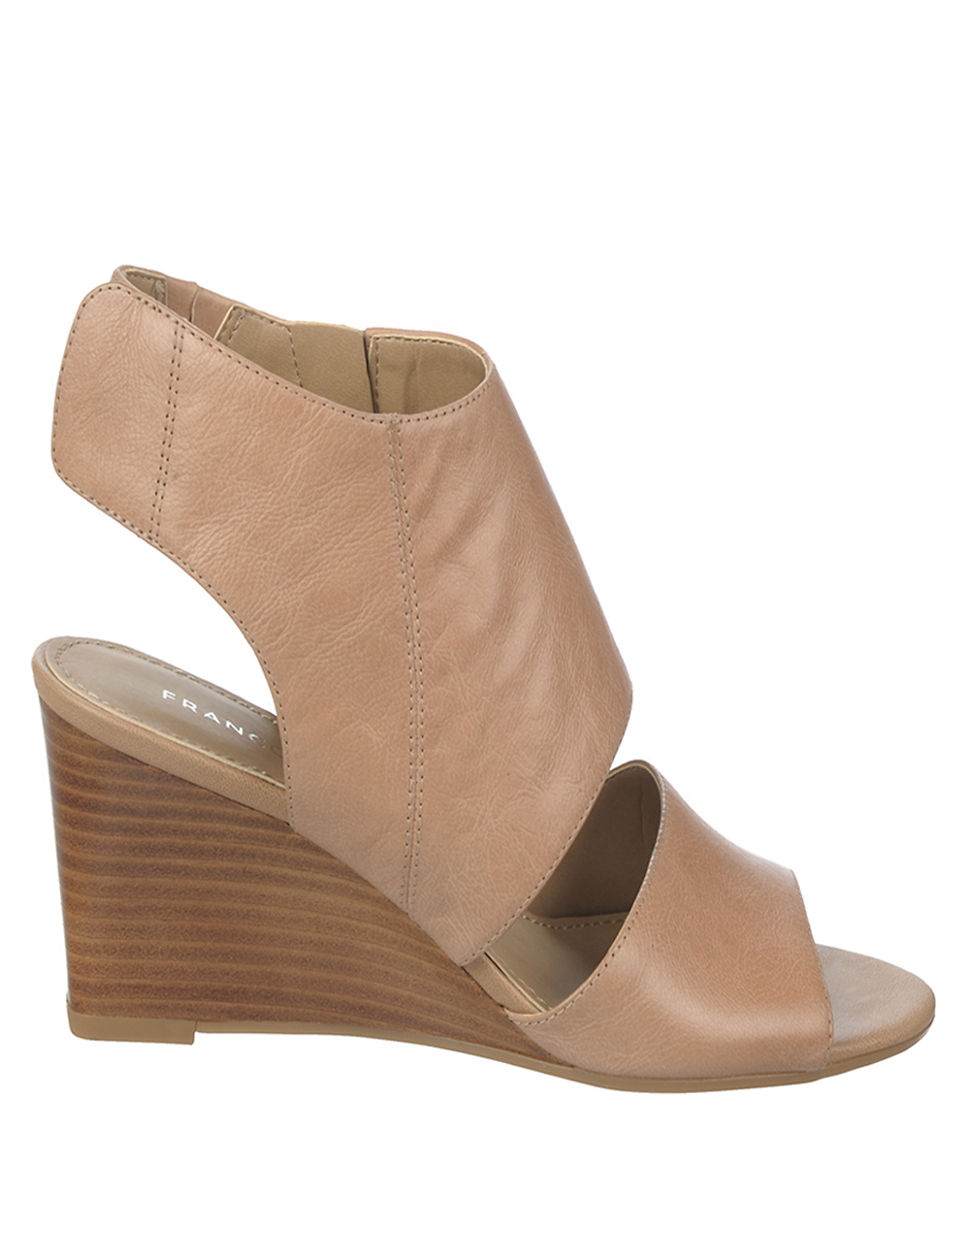 franco sarto kressa wedge sandals in beige taupe lyst